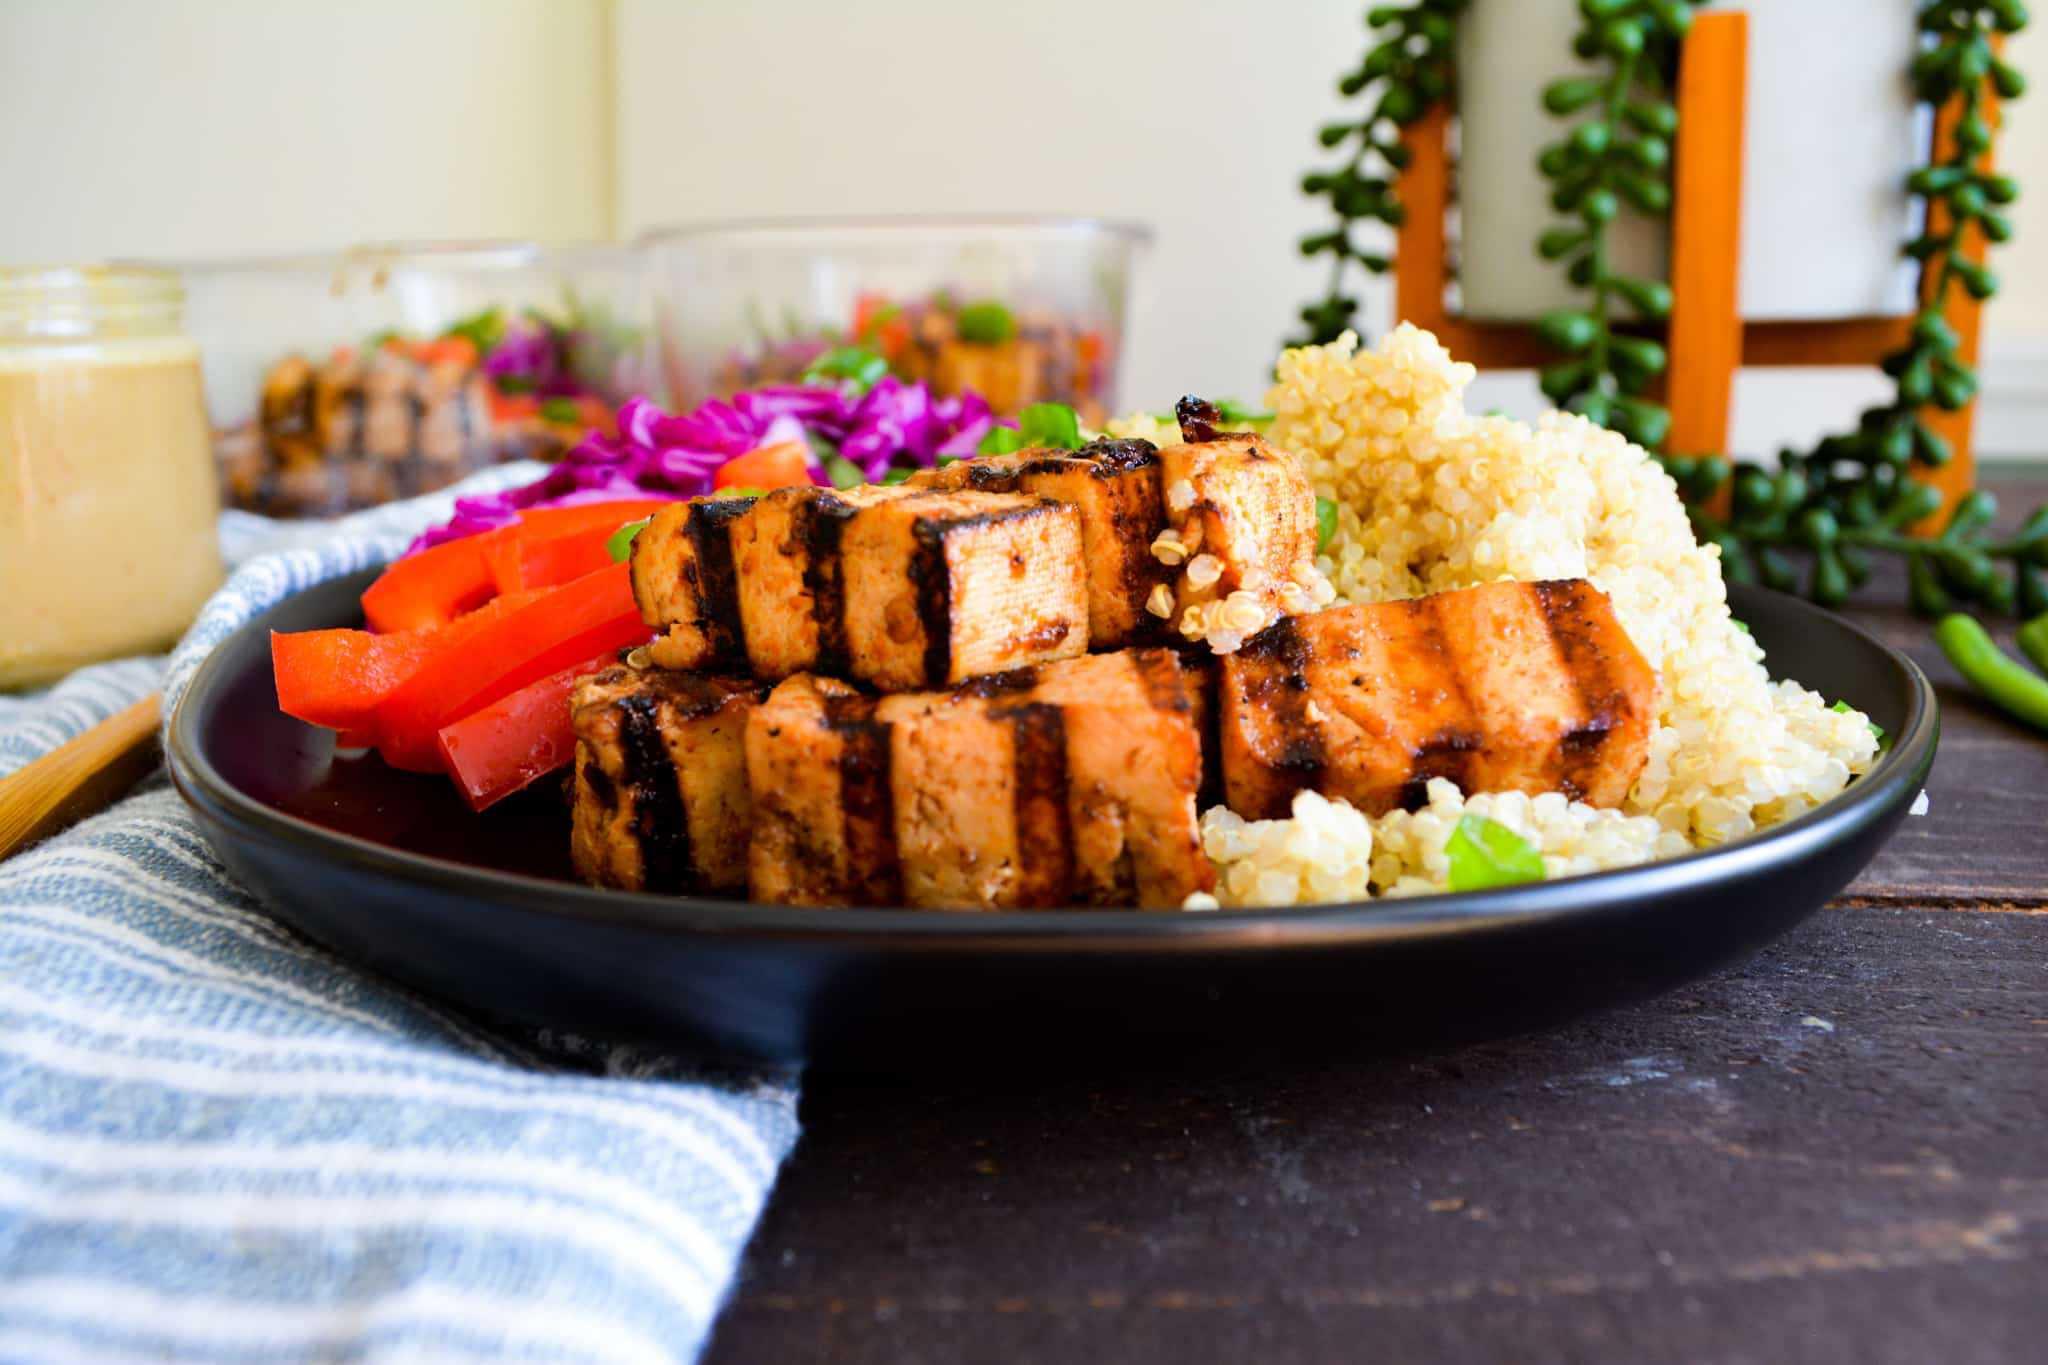 Chili + Garlic Grilled Tofu